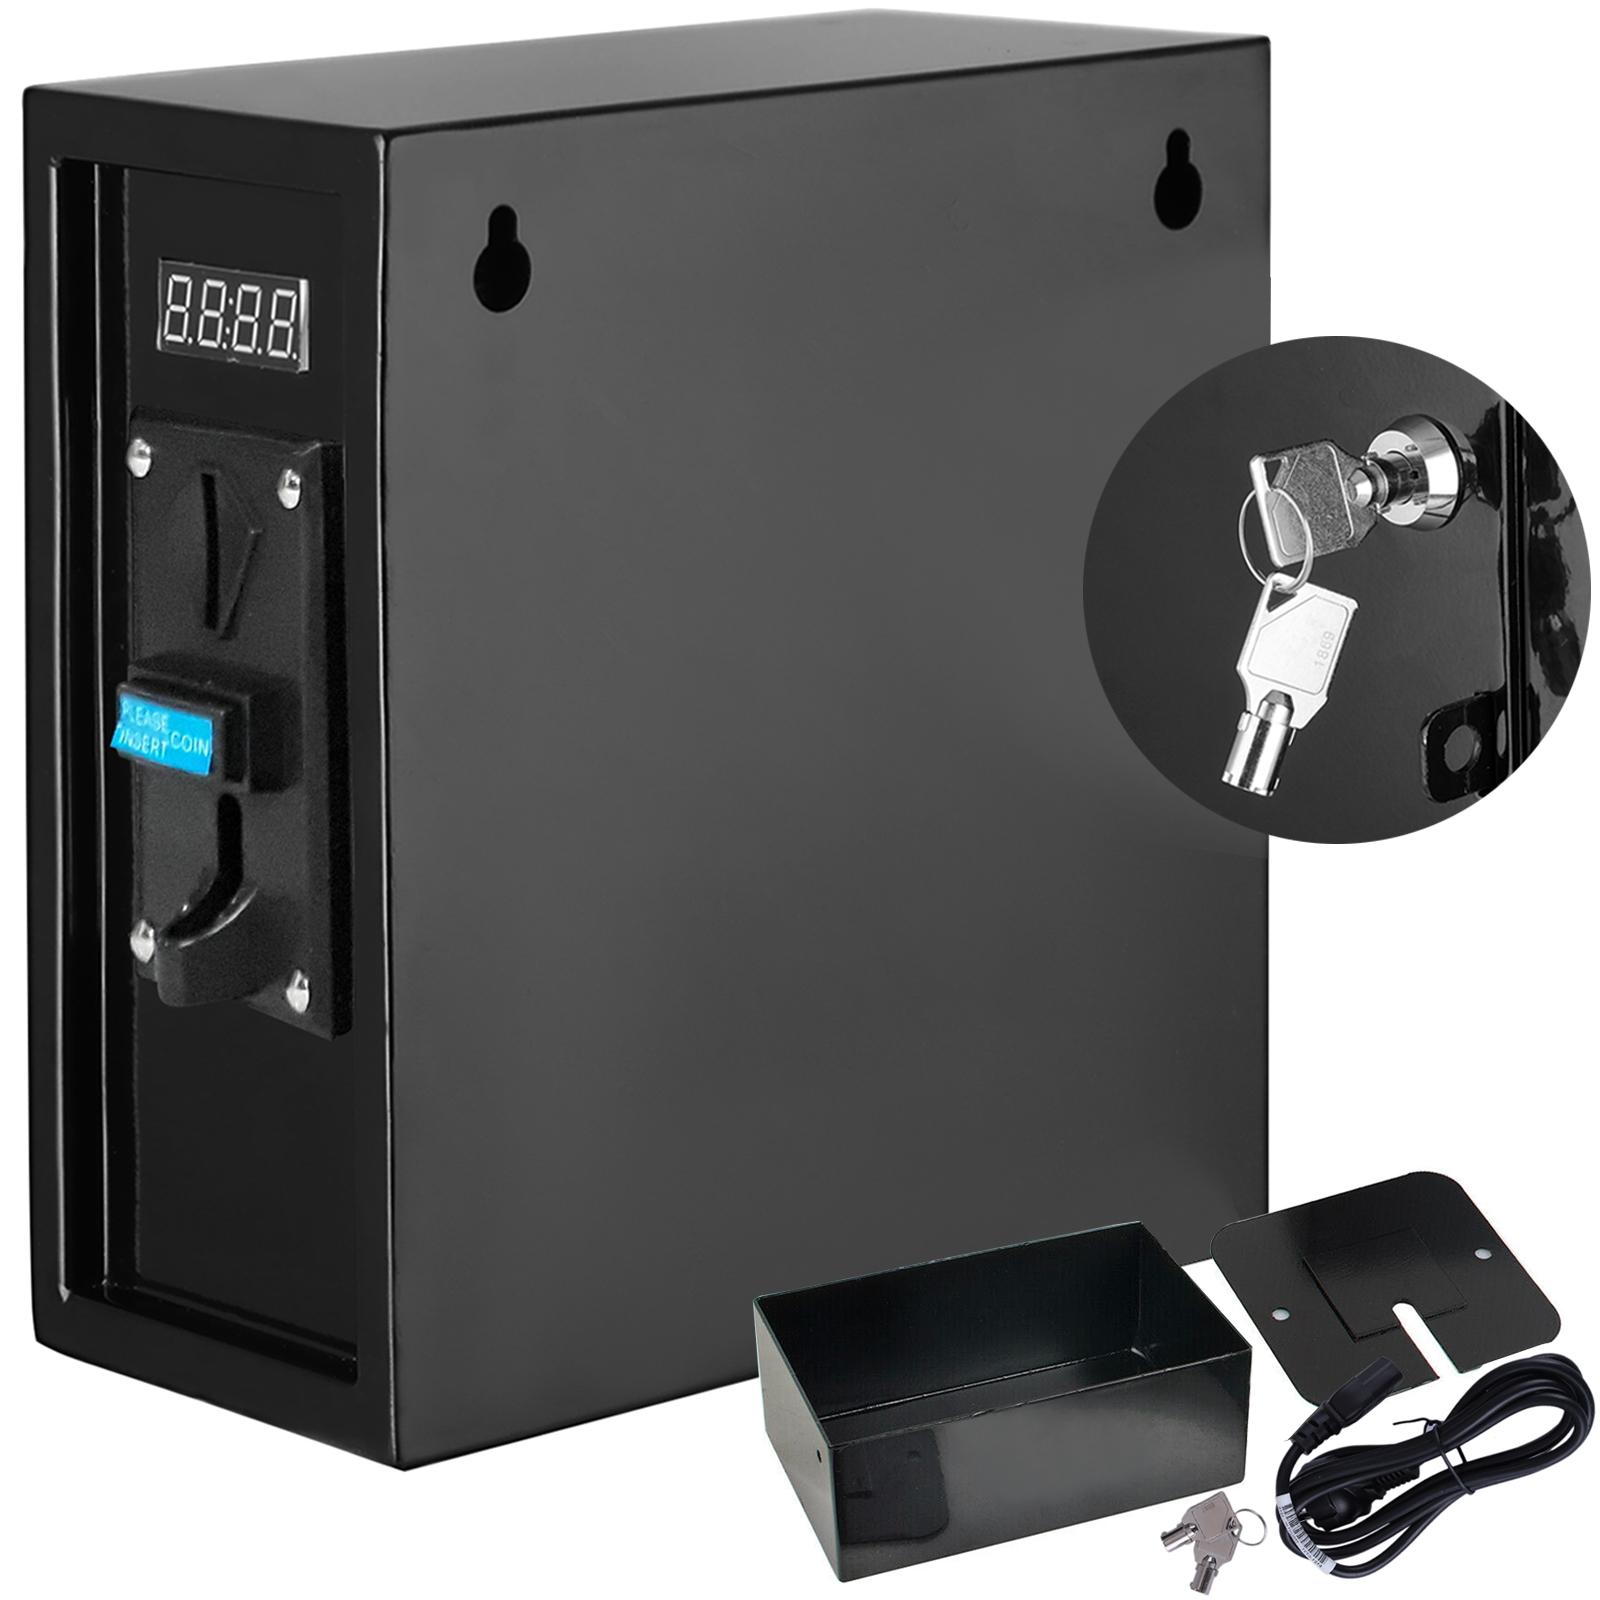 Monnaie-Distributeur-Munzkassierer-Zeiteinstellung-Munzprufer-Munzautomat